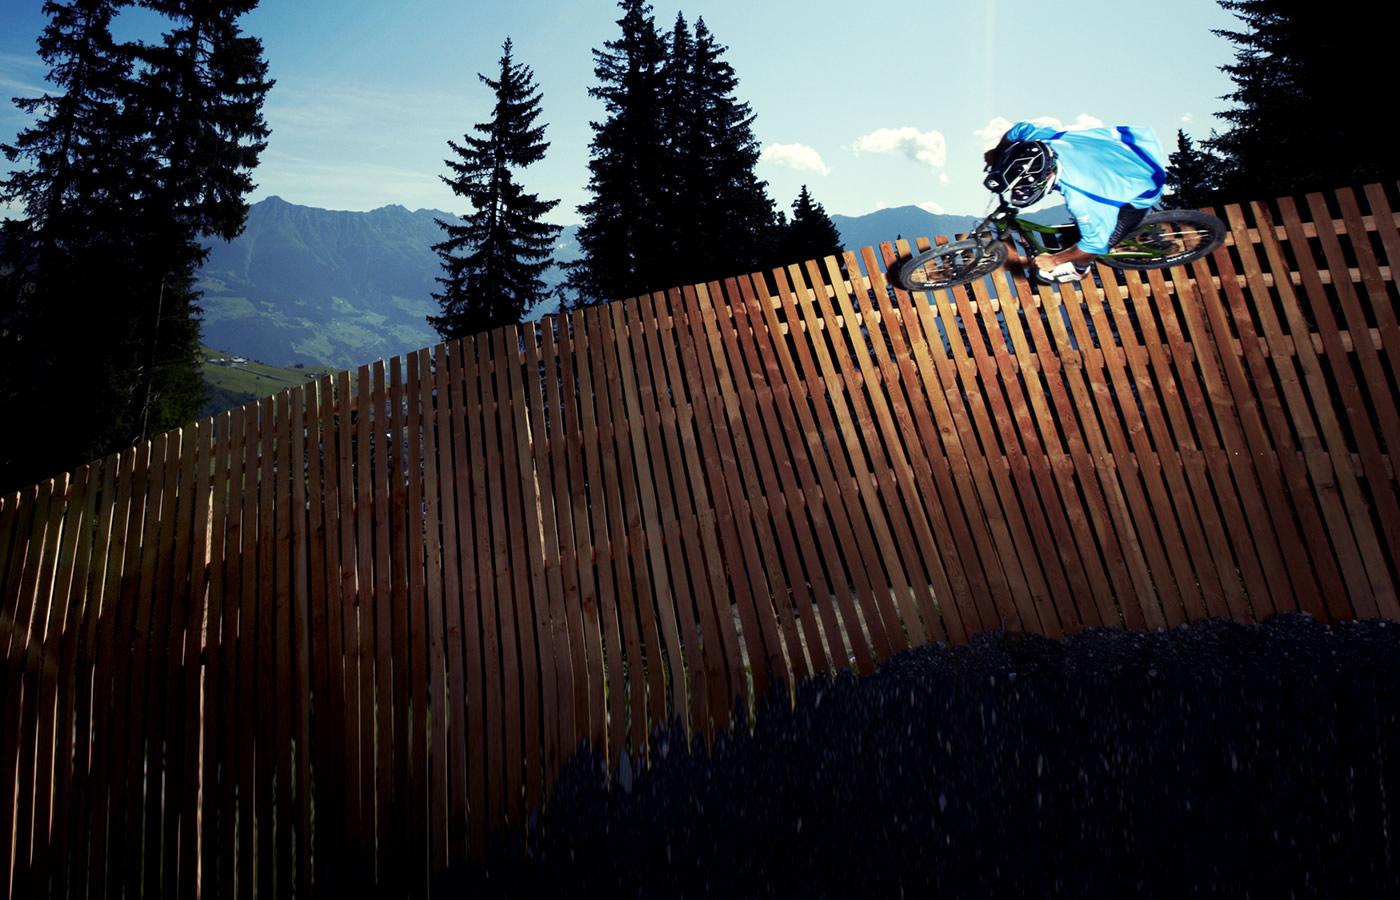 Steilkurve Bikepark Fiss - Hotel in Nähe Bikepark SFL - Tirol.